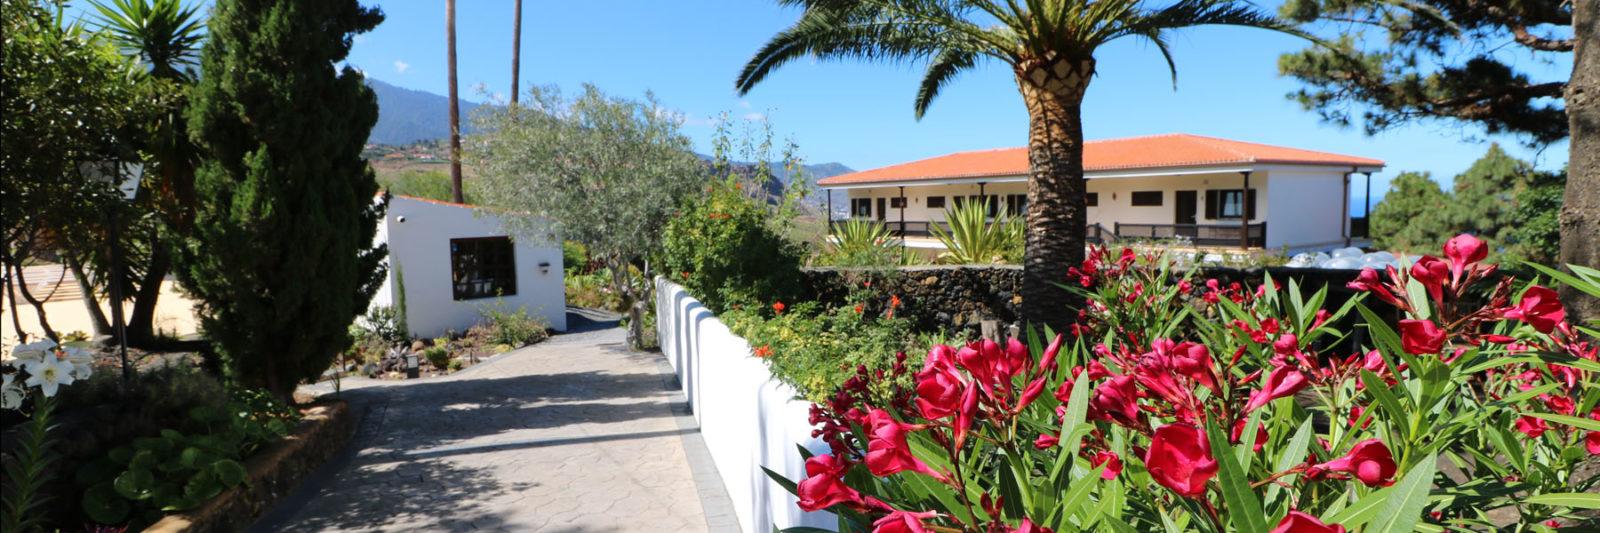 La Palma - Apartments Miranda - Entrance